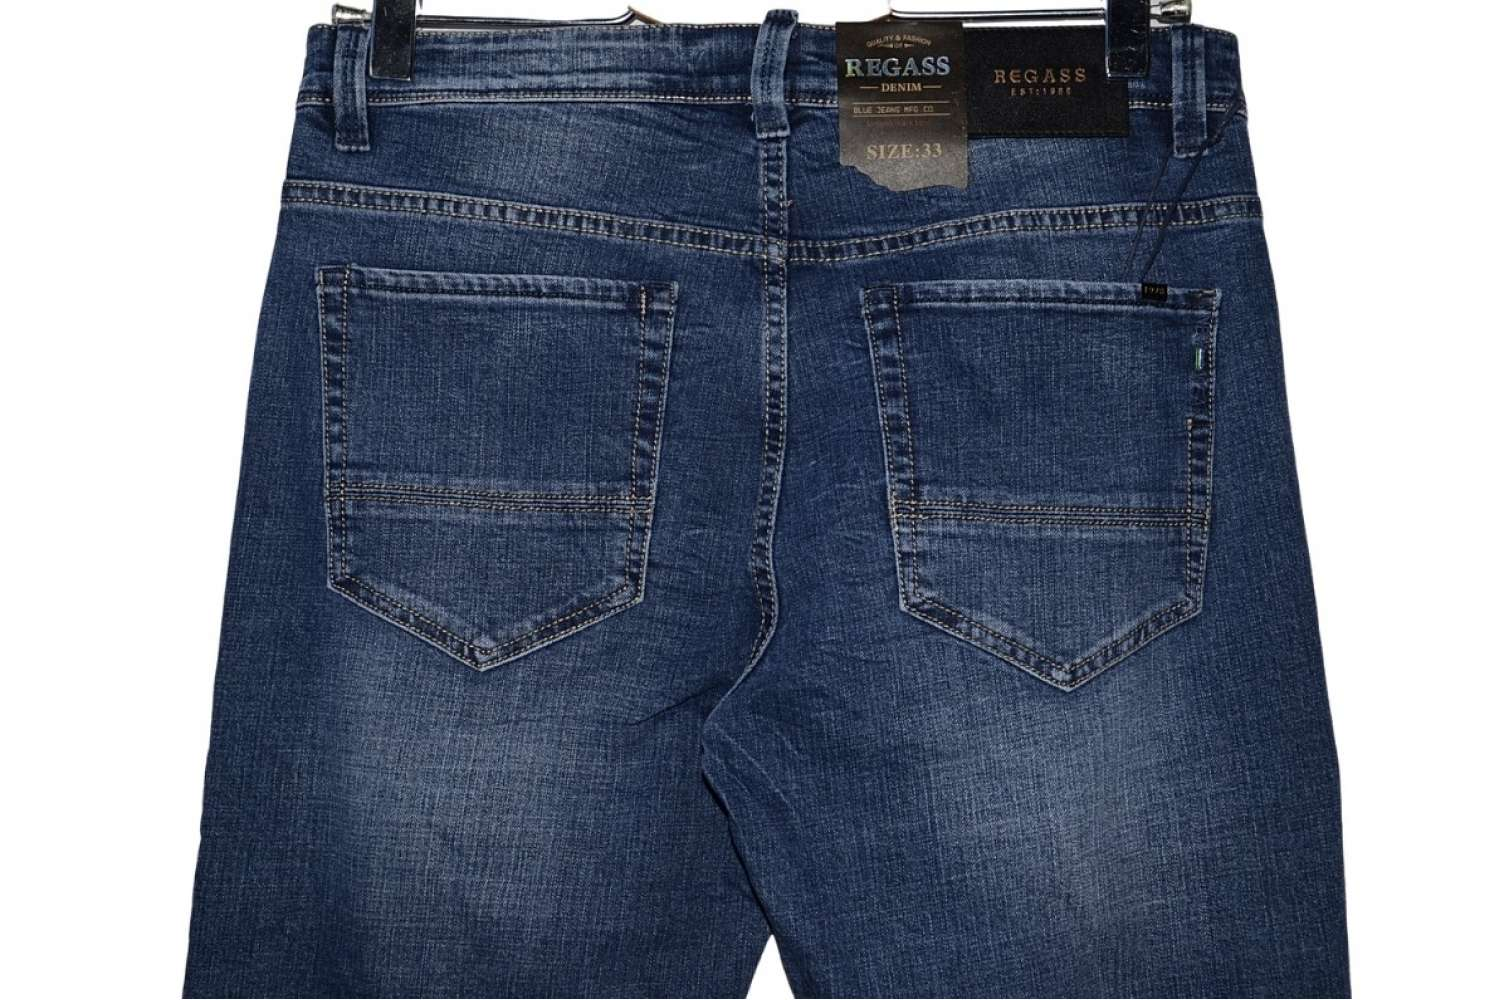 Regass Jeans